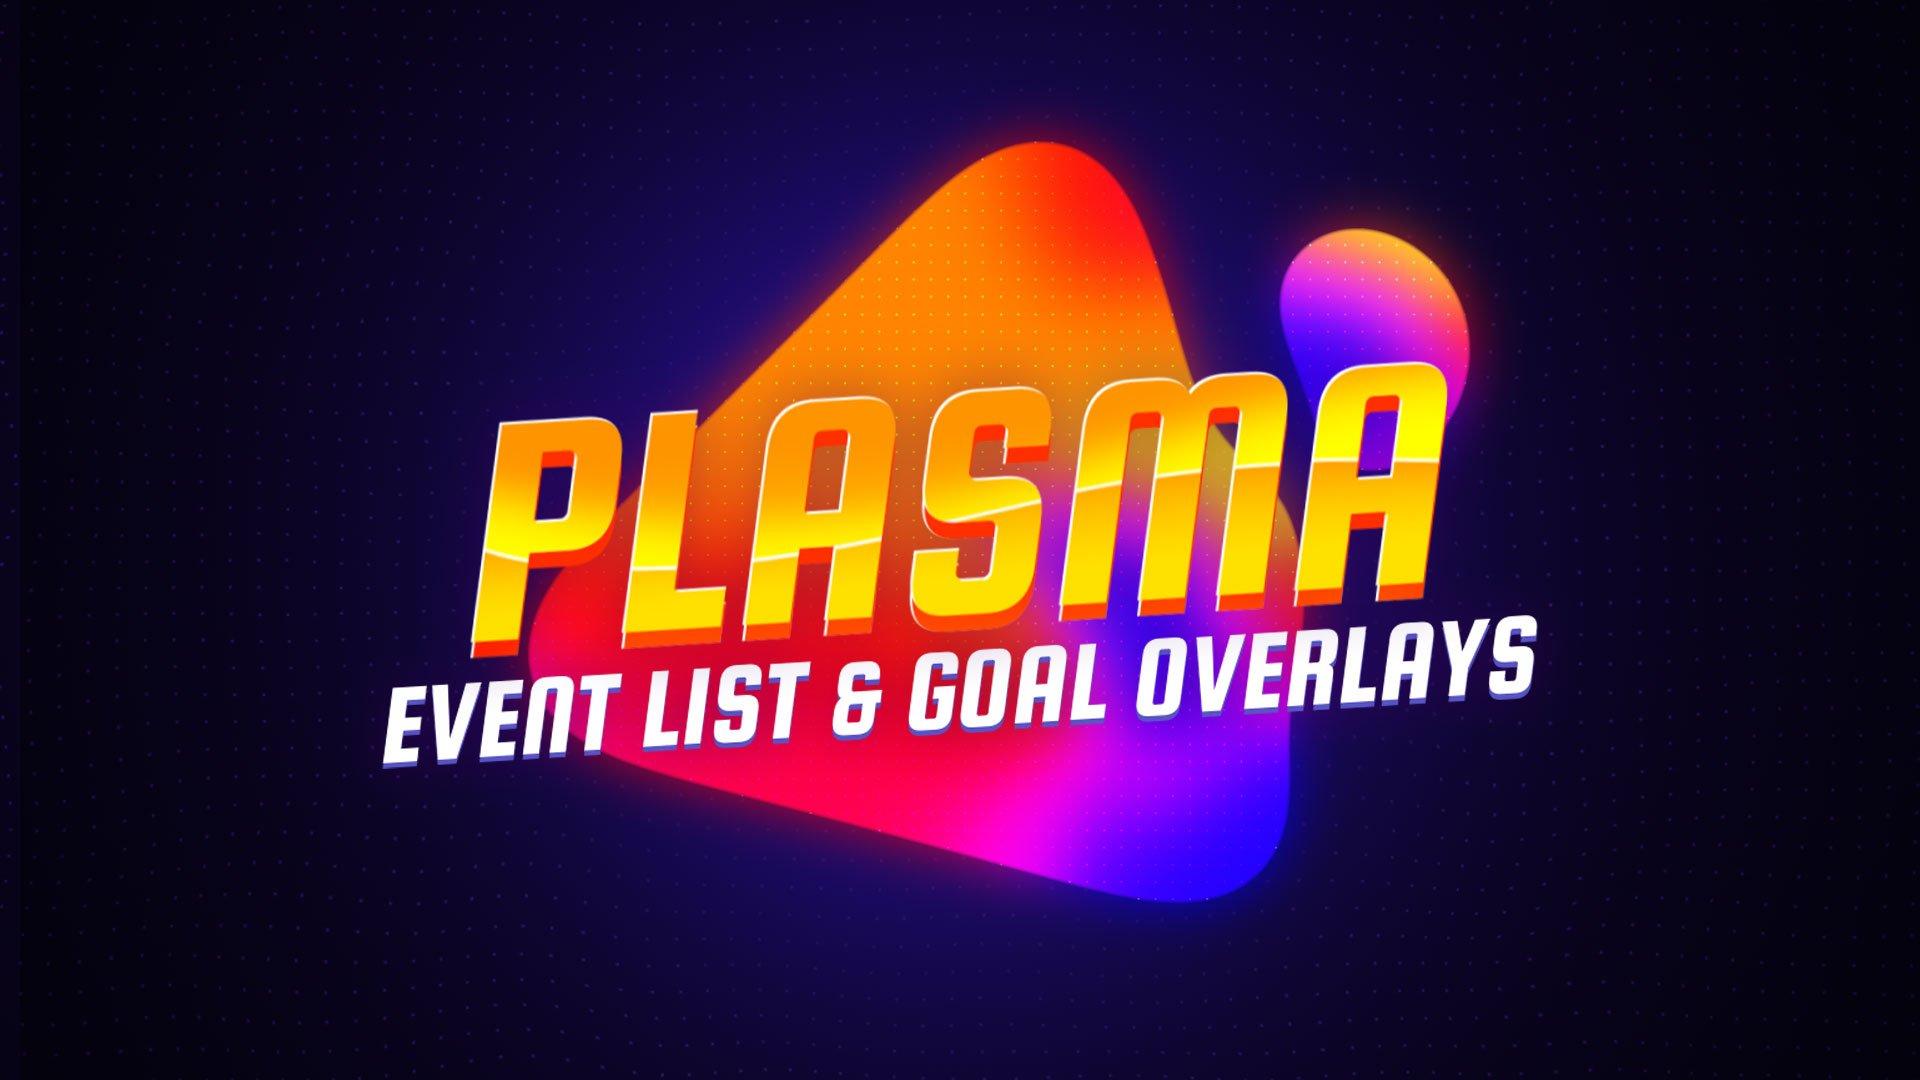 Plasma Event List Goal Overlays